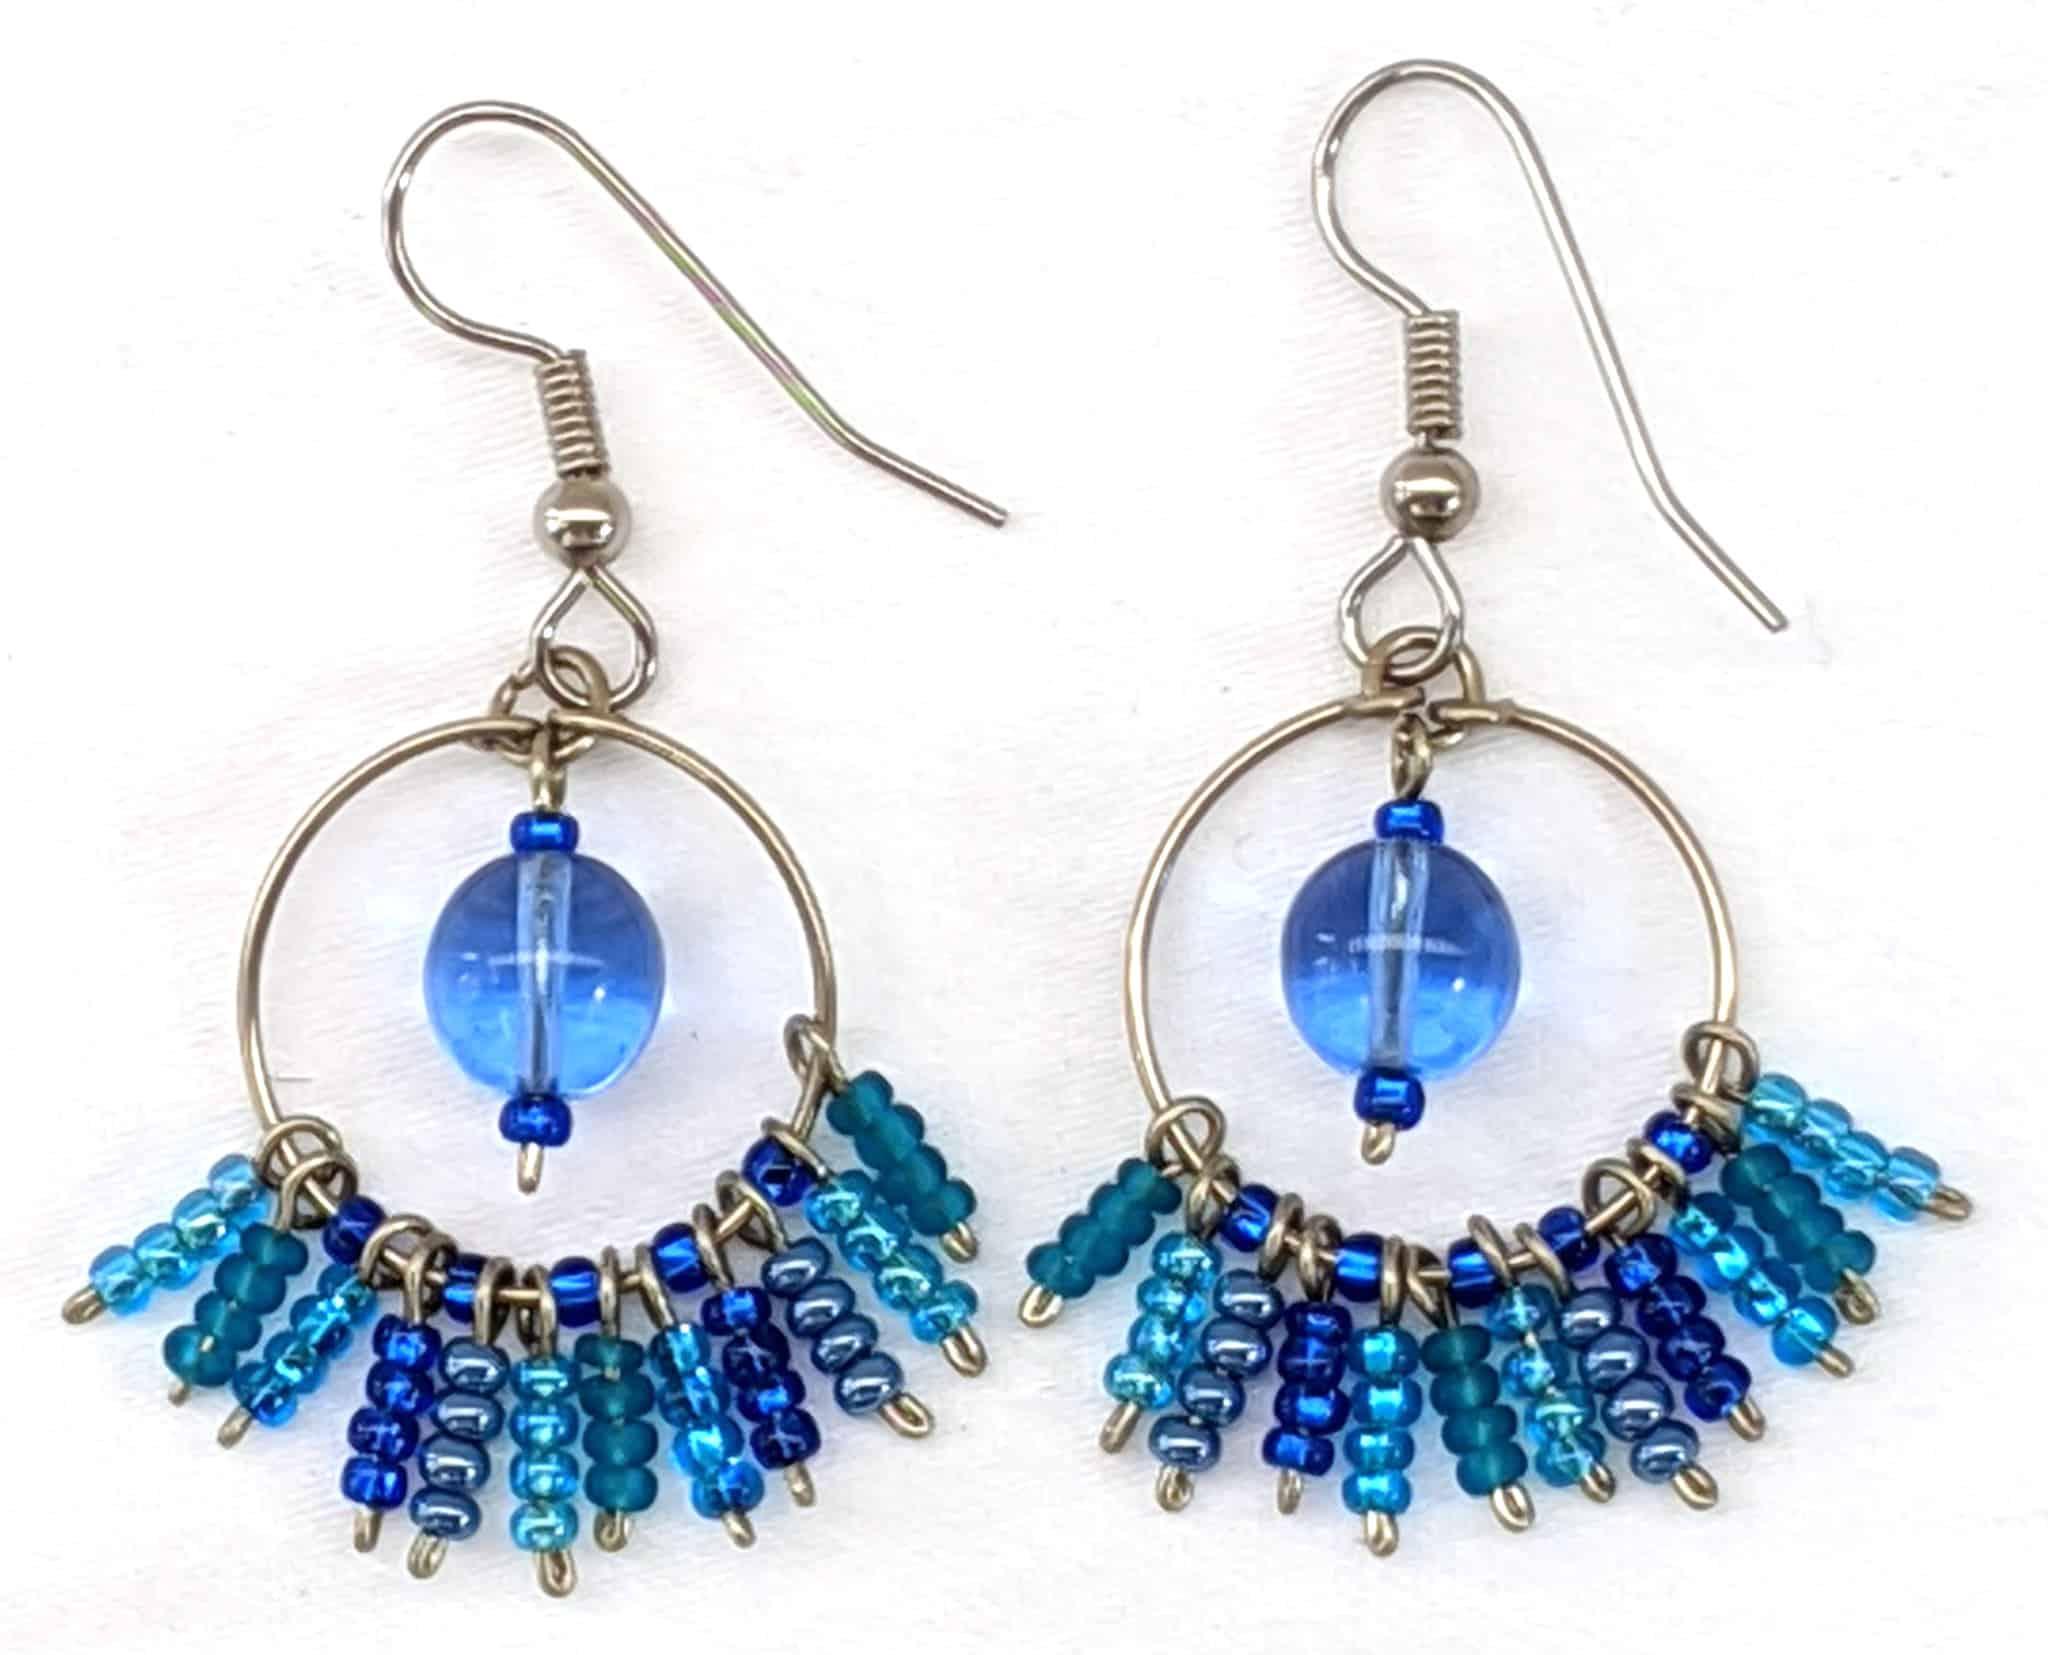 Circle Fringe Beaded Earrings - Blues